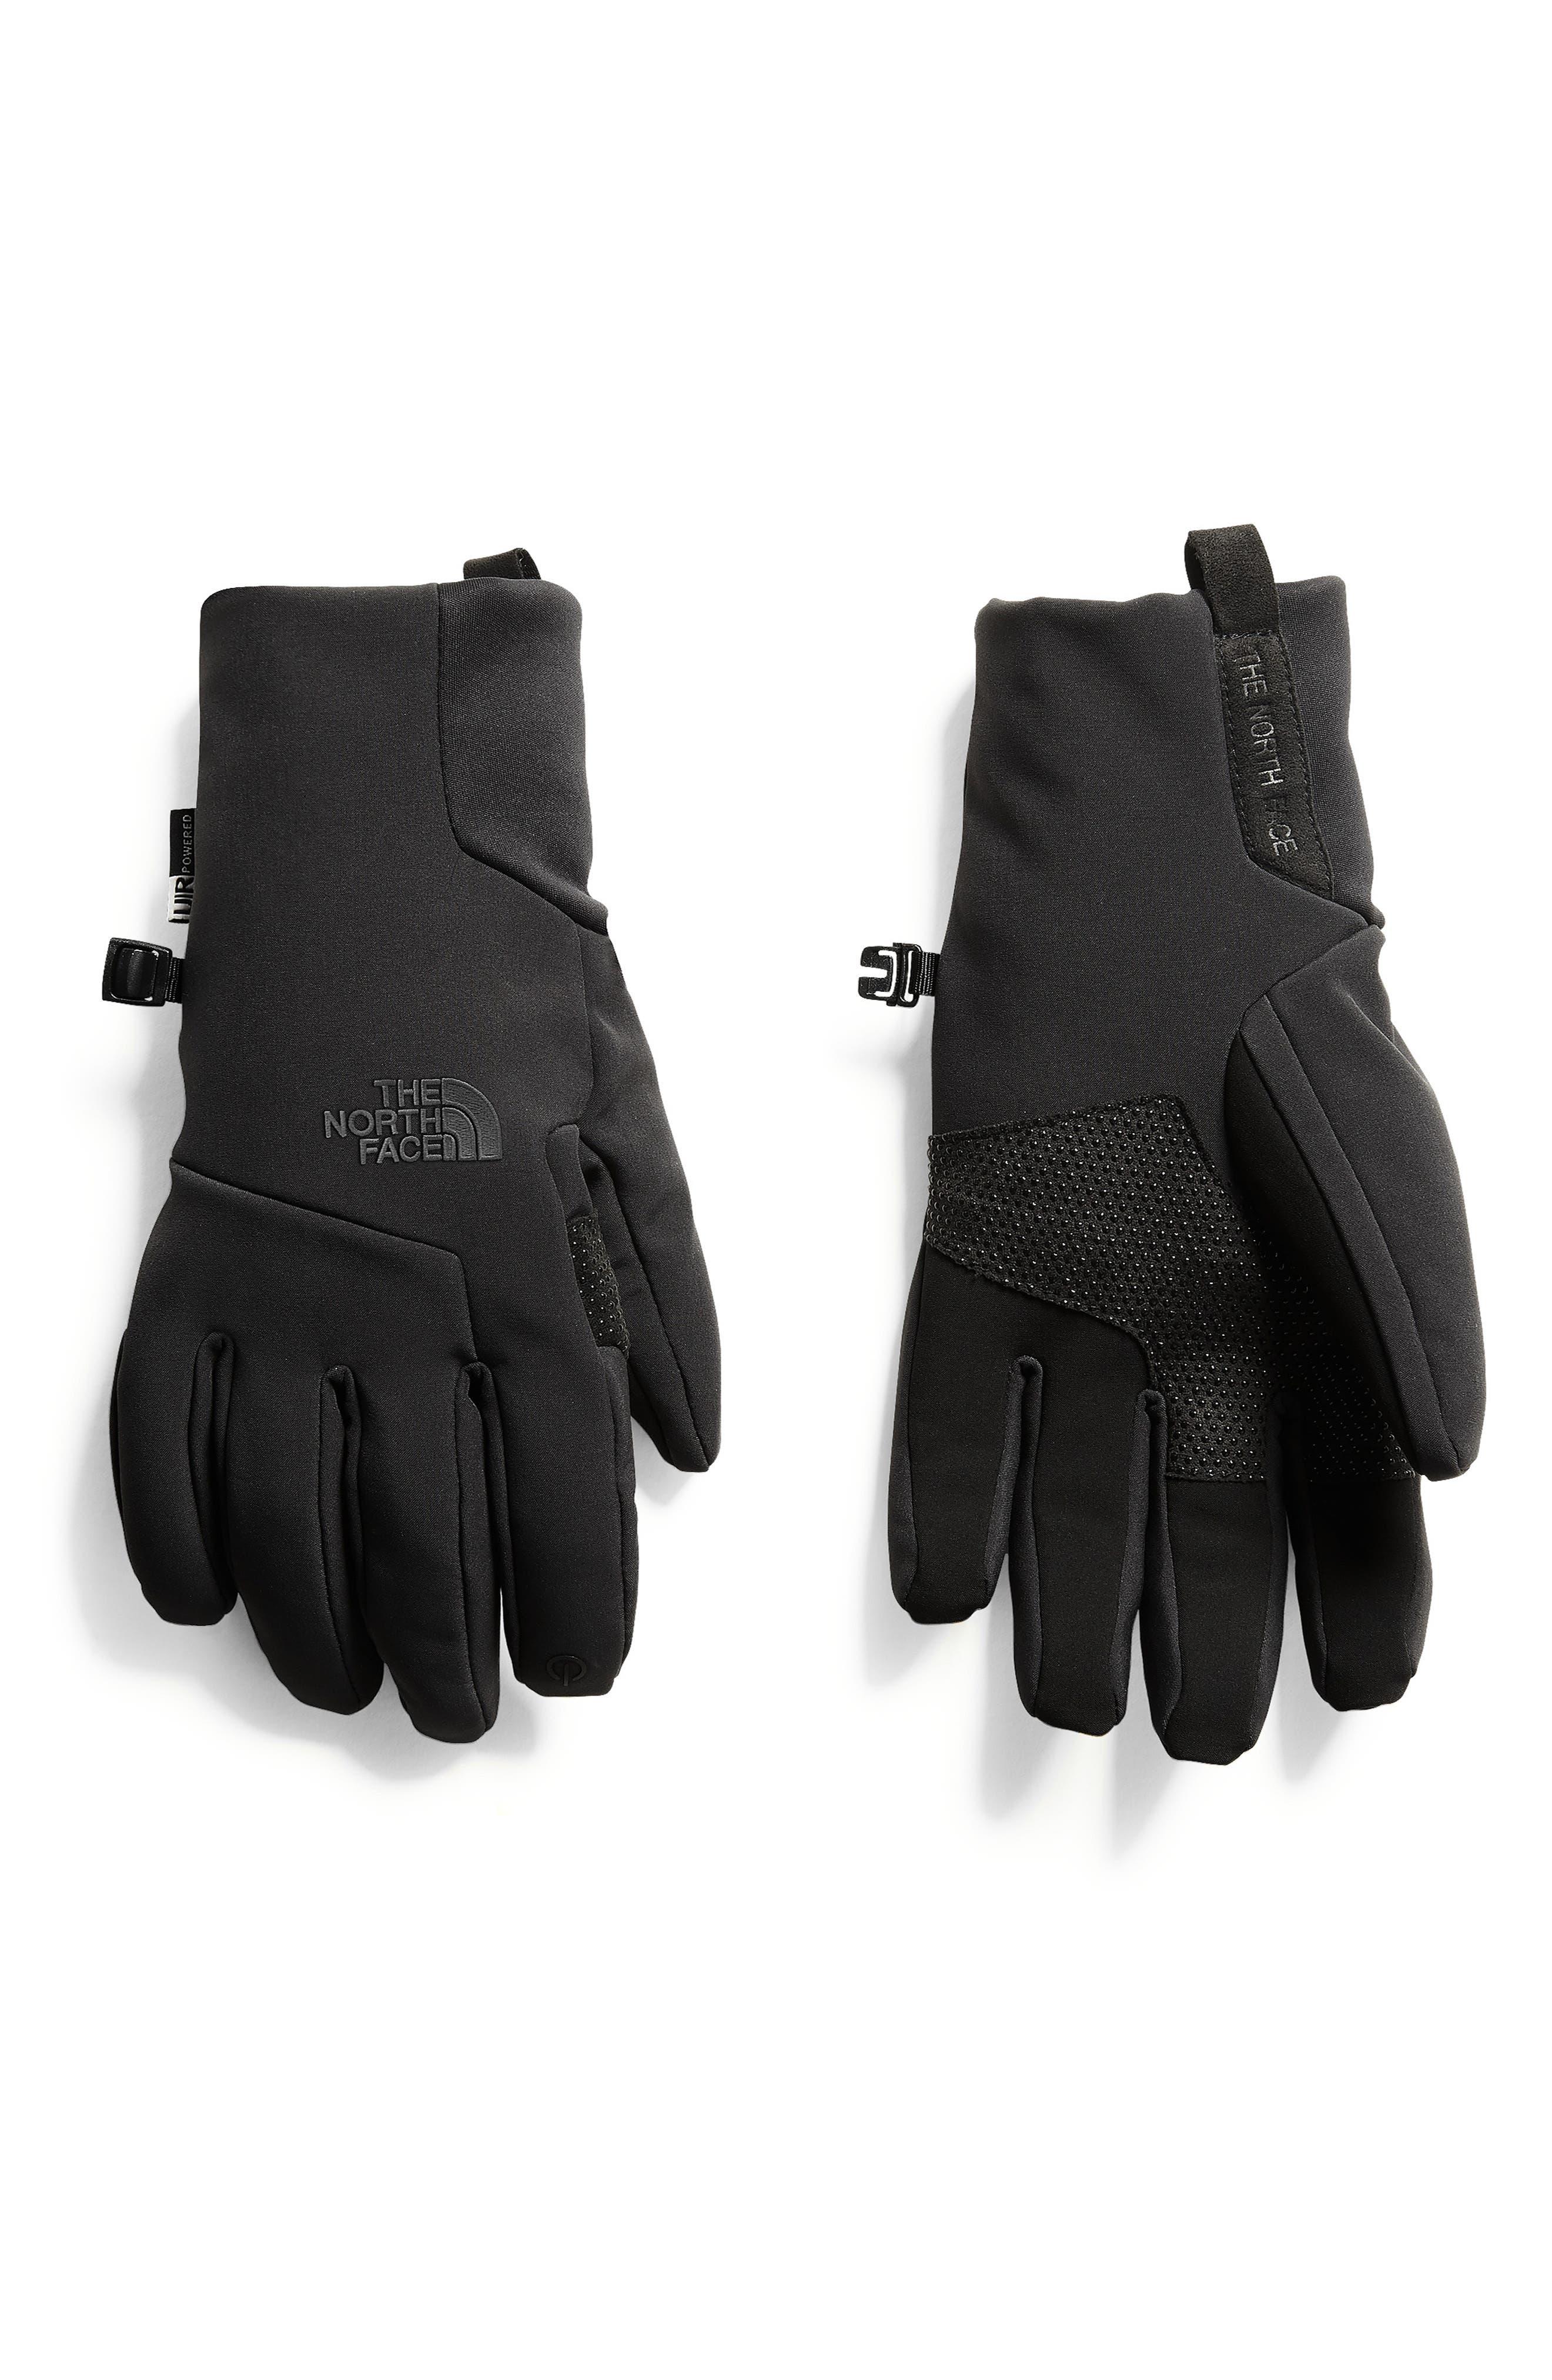 Apex Etip<sup>™</sup> Tech Gloves,                             Main thumbnail 1, color,                             TNF BLACK